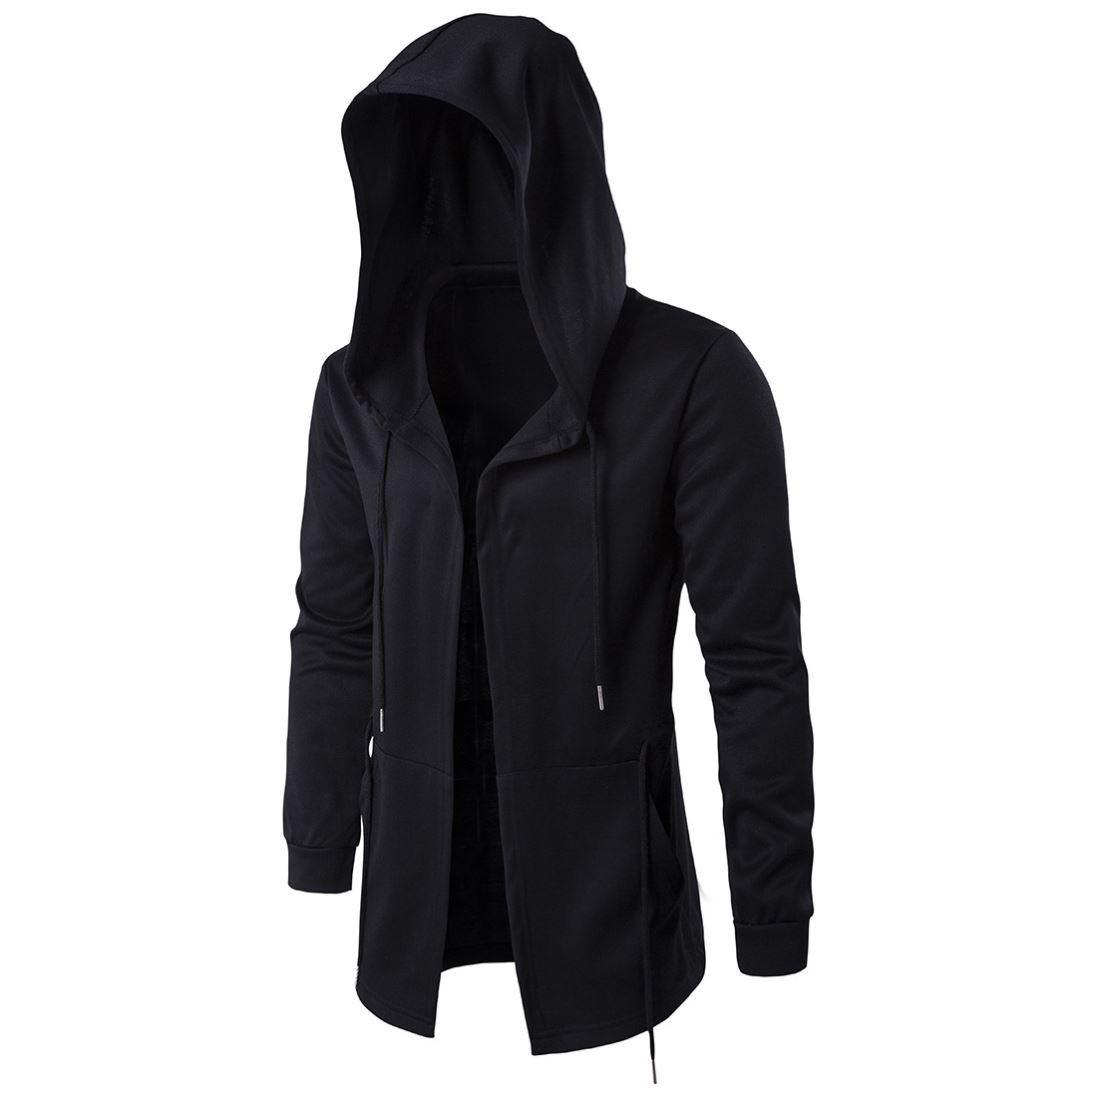 Mens trench coat mens medium length Cape wizard cloak Hooded Coat mens jacket